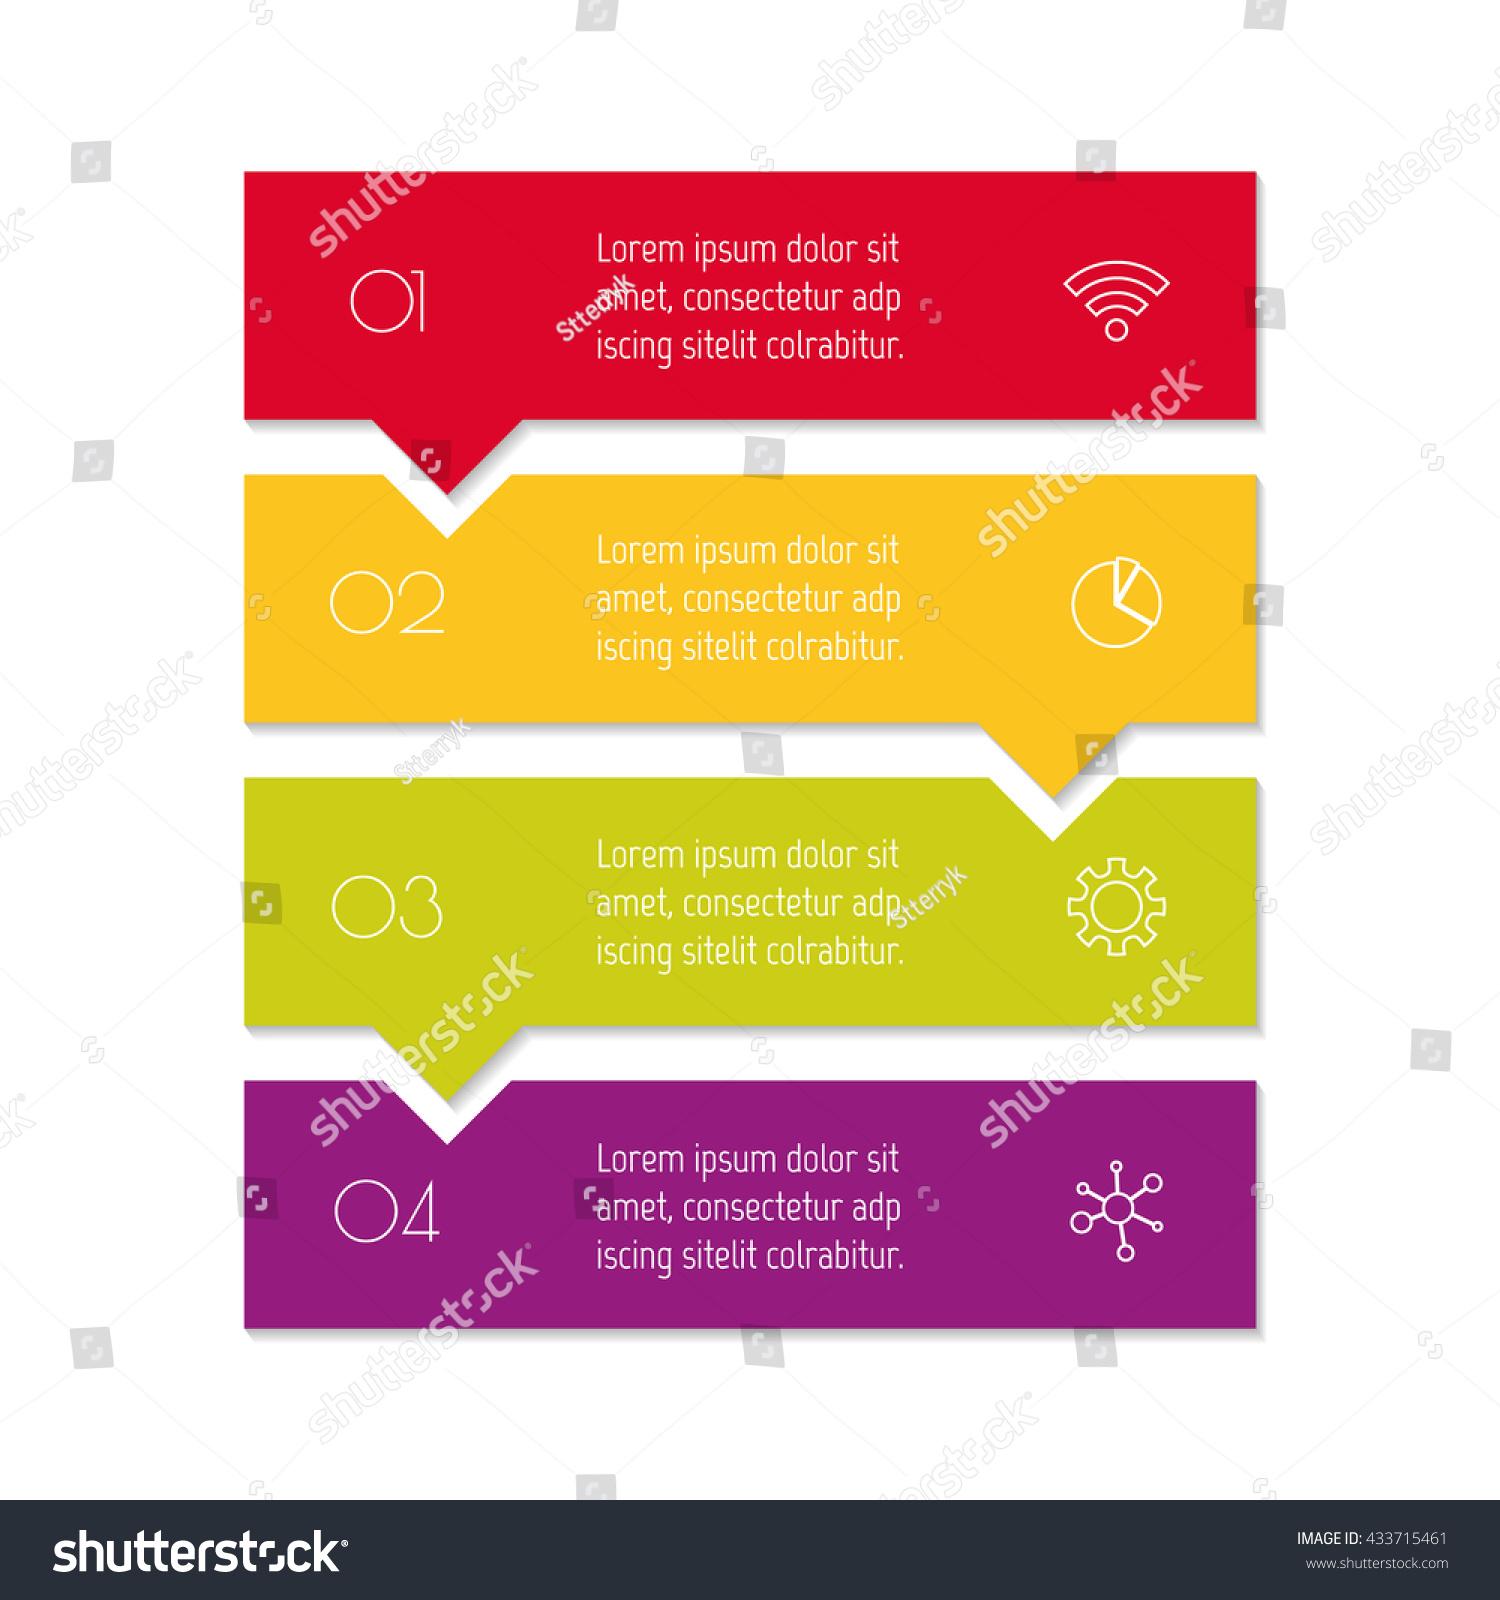 Vertical Puzzle Infographic Diagram Four Options Stock